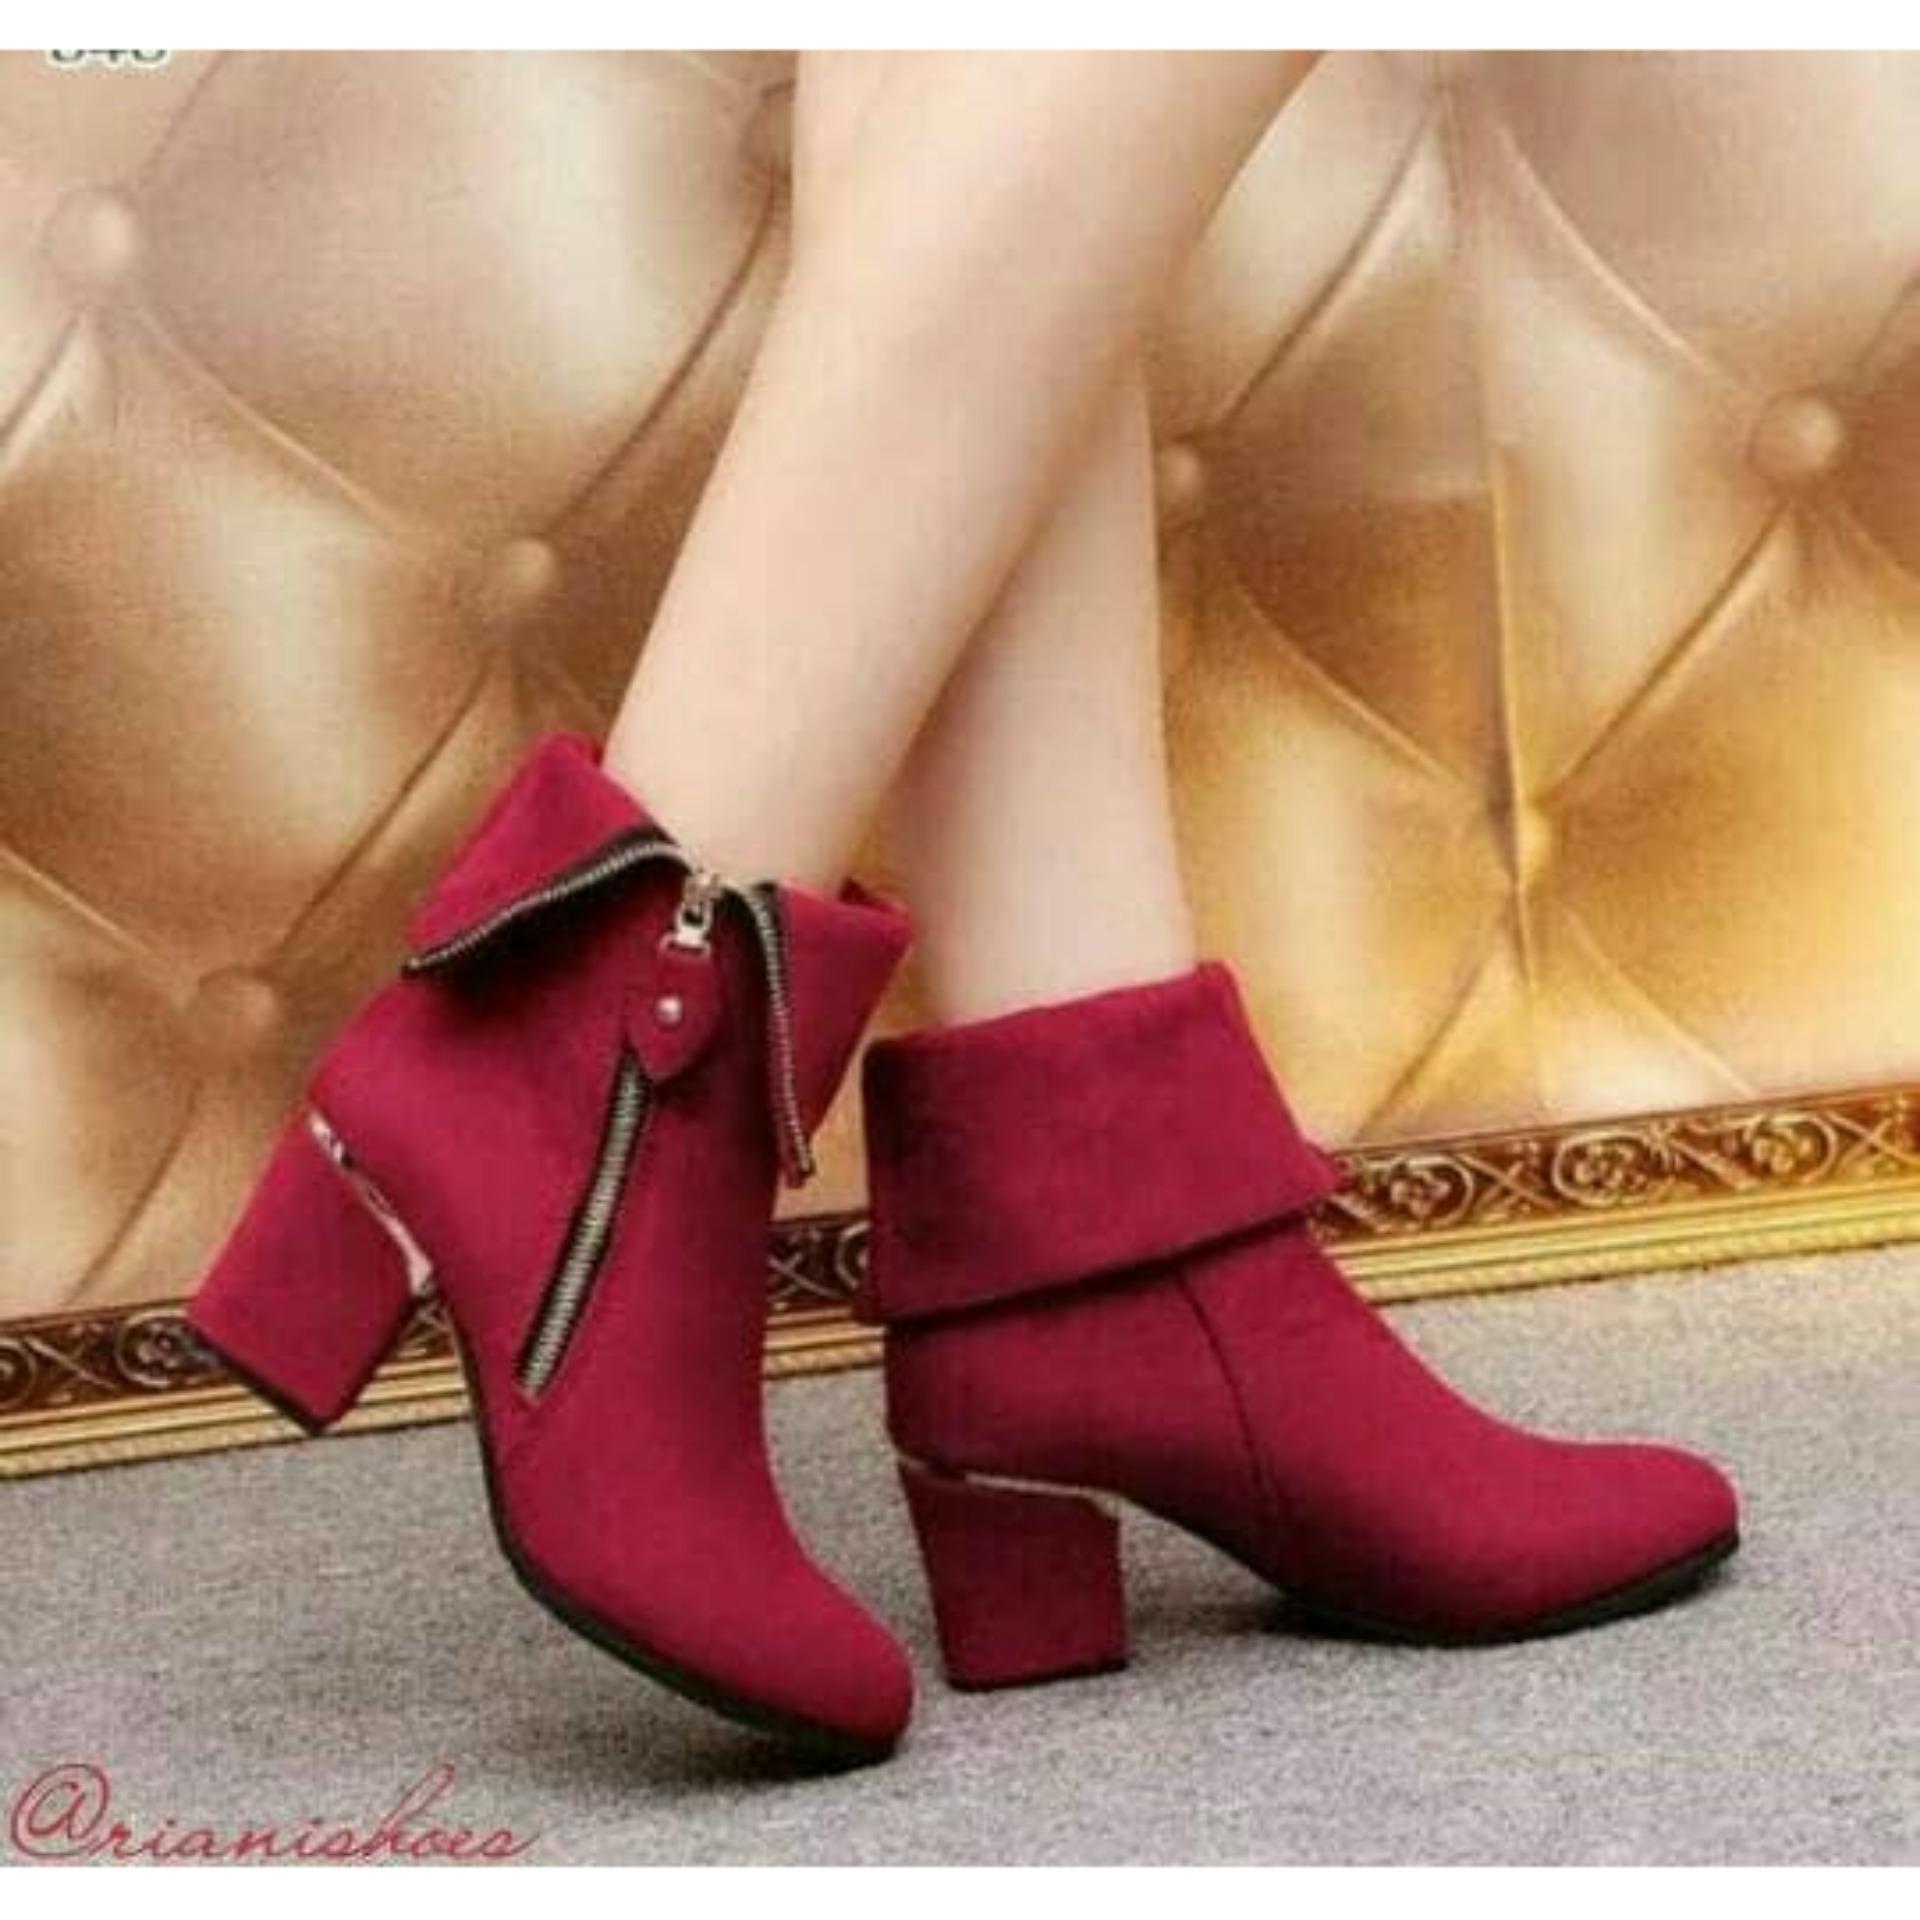 Hs Sepatu Boots High Heels Press Kembang Merah Cek Harga Terkini Boot Ls09 M Sleting Lipat 30